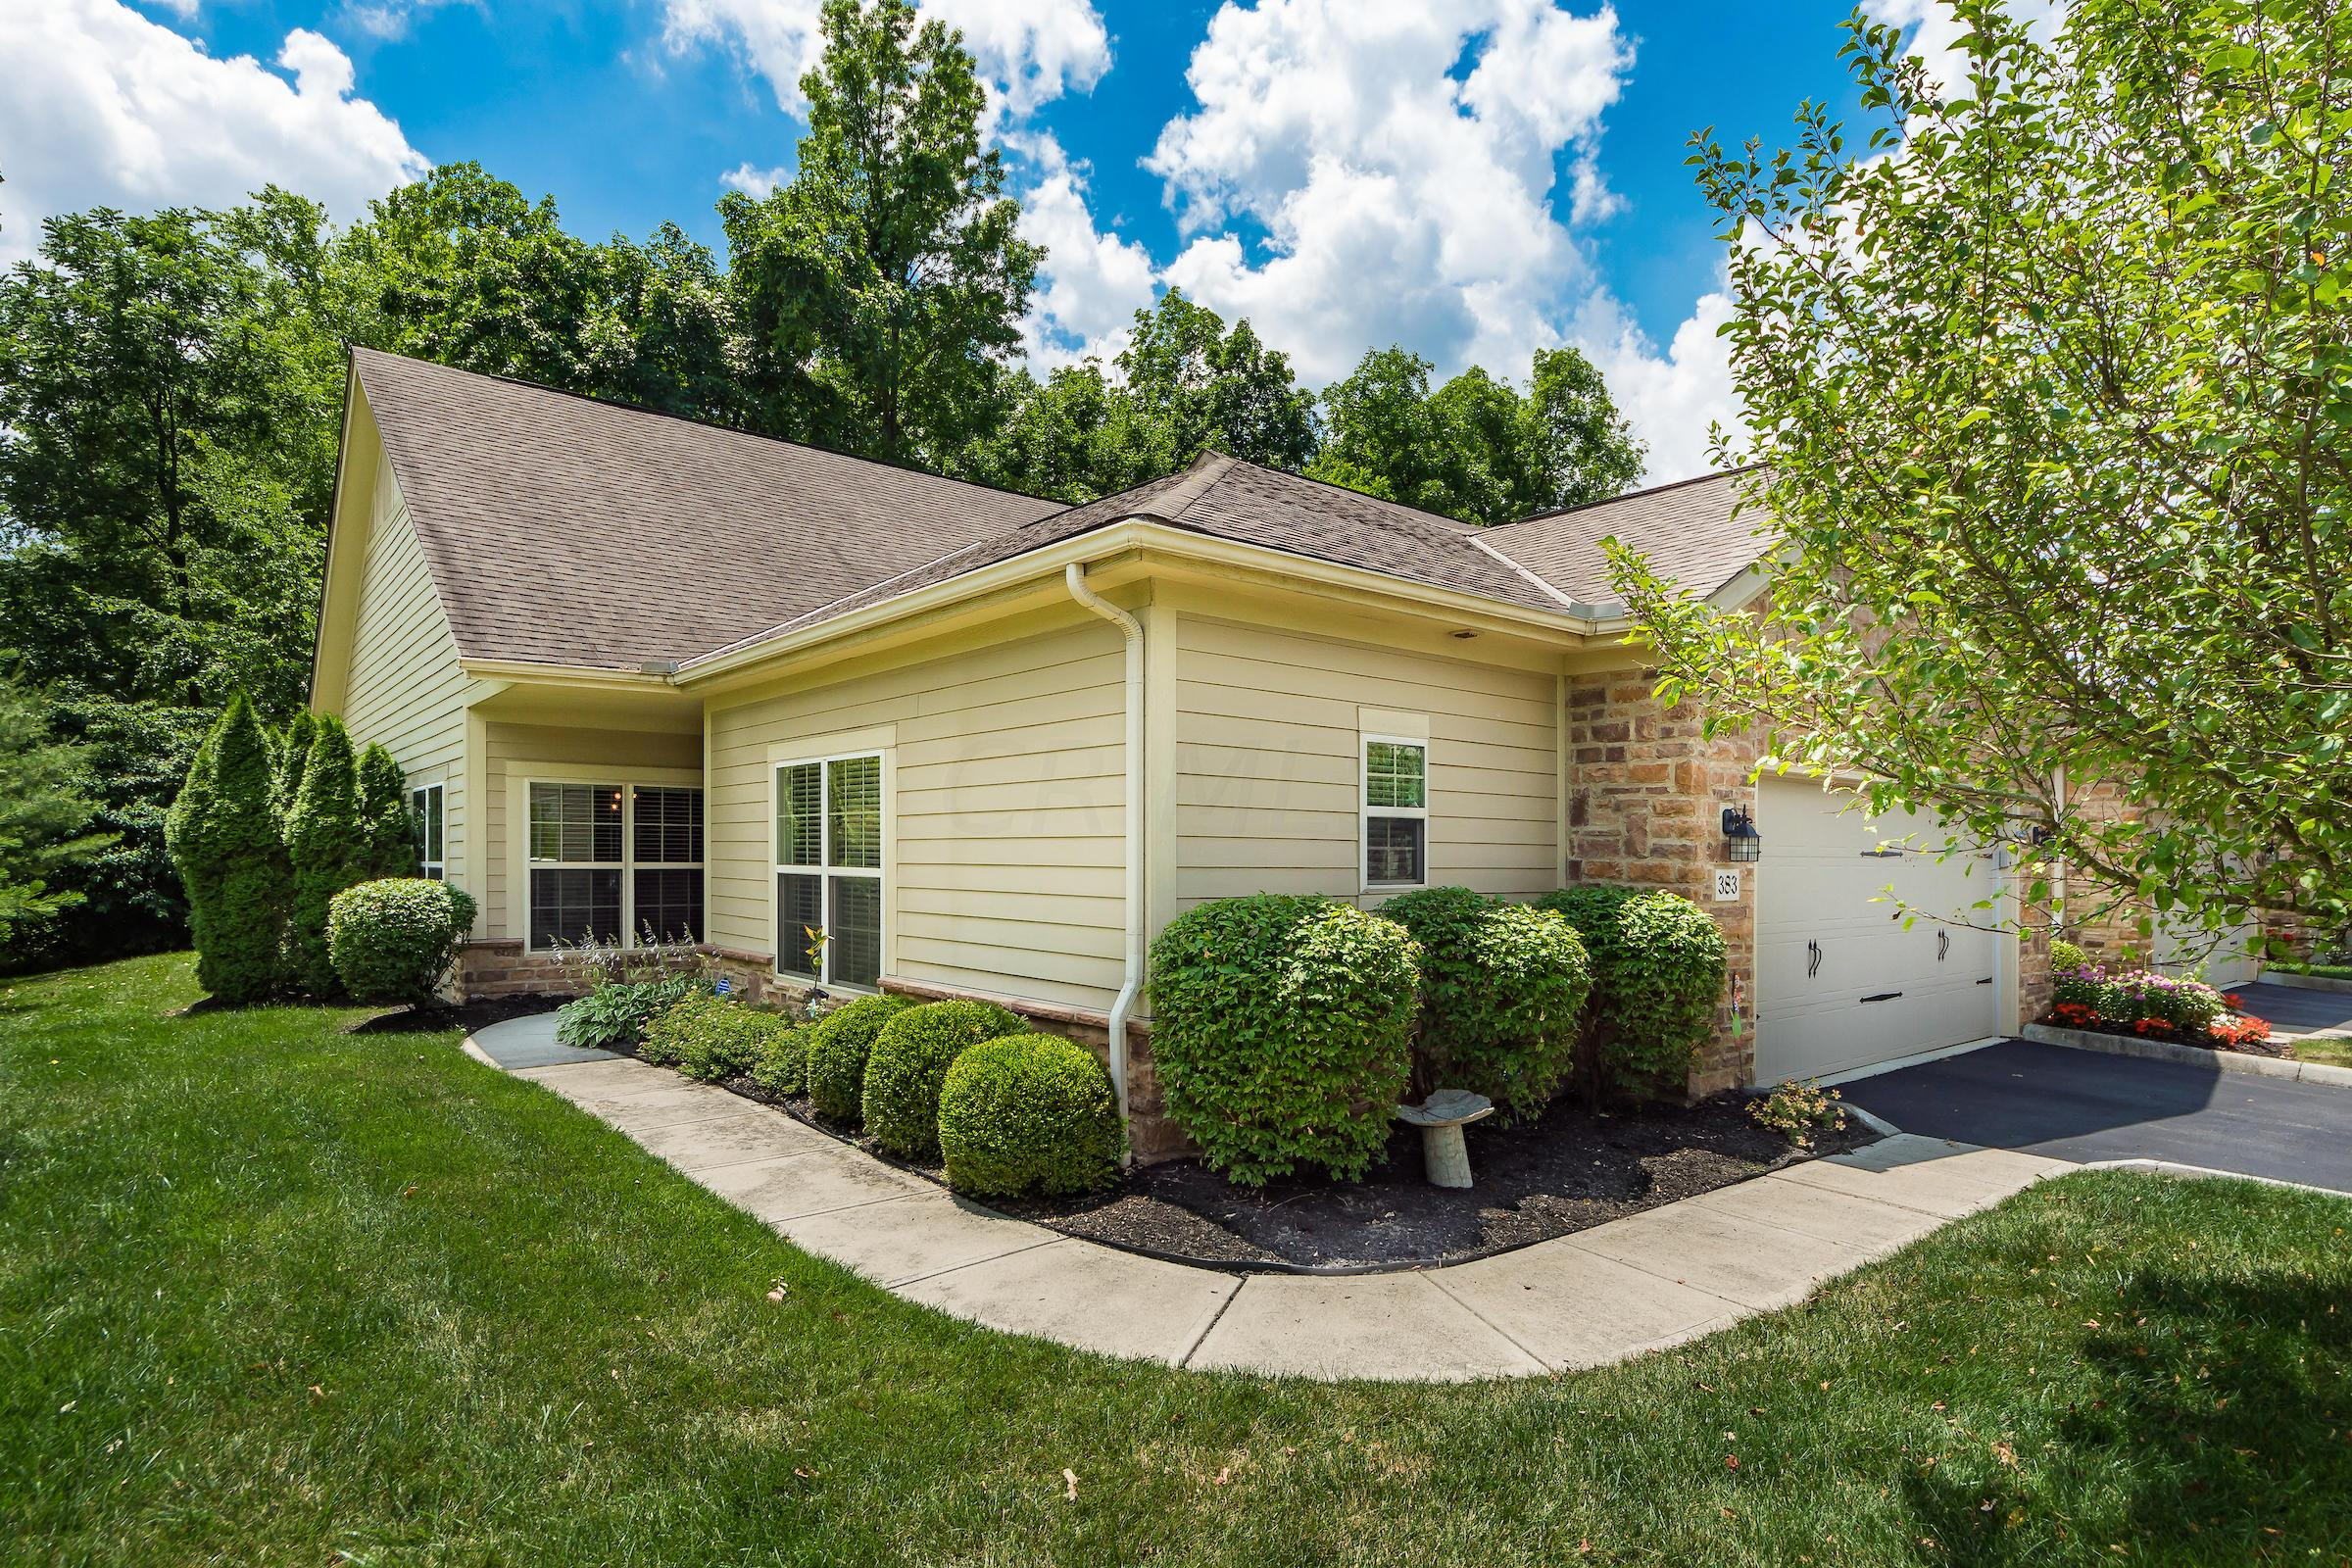 383 Slate Crossing Drive, Delaware, Ohio 43015, 2 Bedrooms Bedrooms, ,3 BathroomsBathrooms,Residential,For Sale,Slate Crossing,220021195